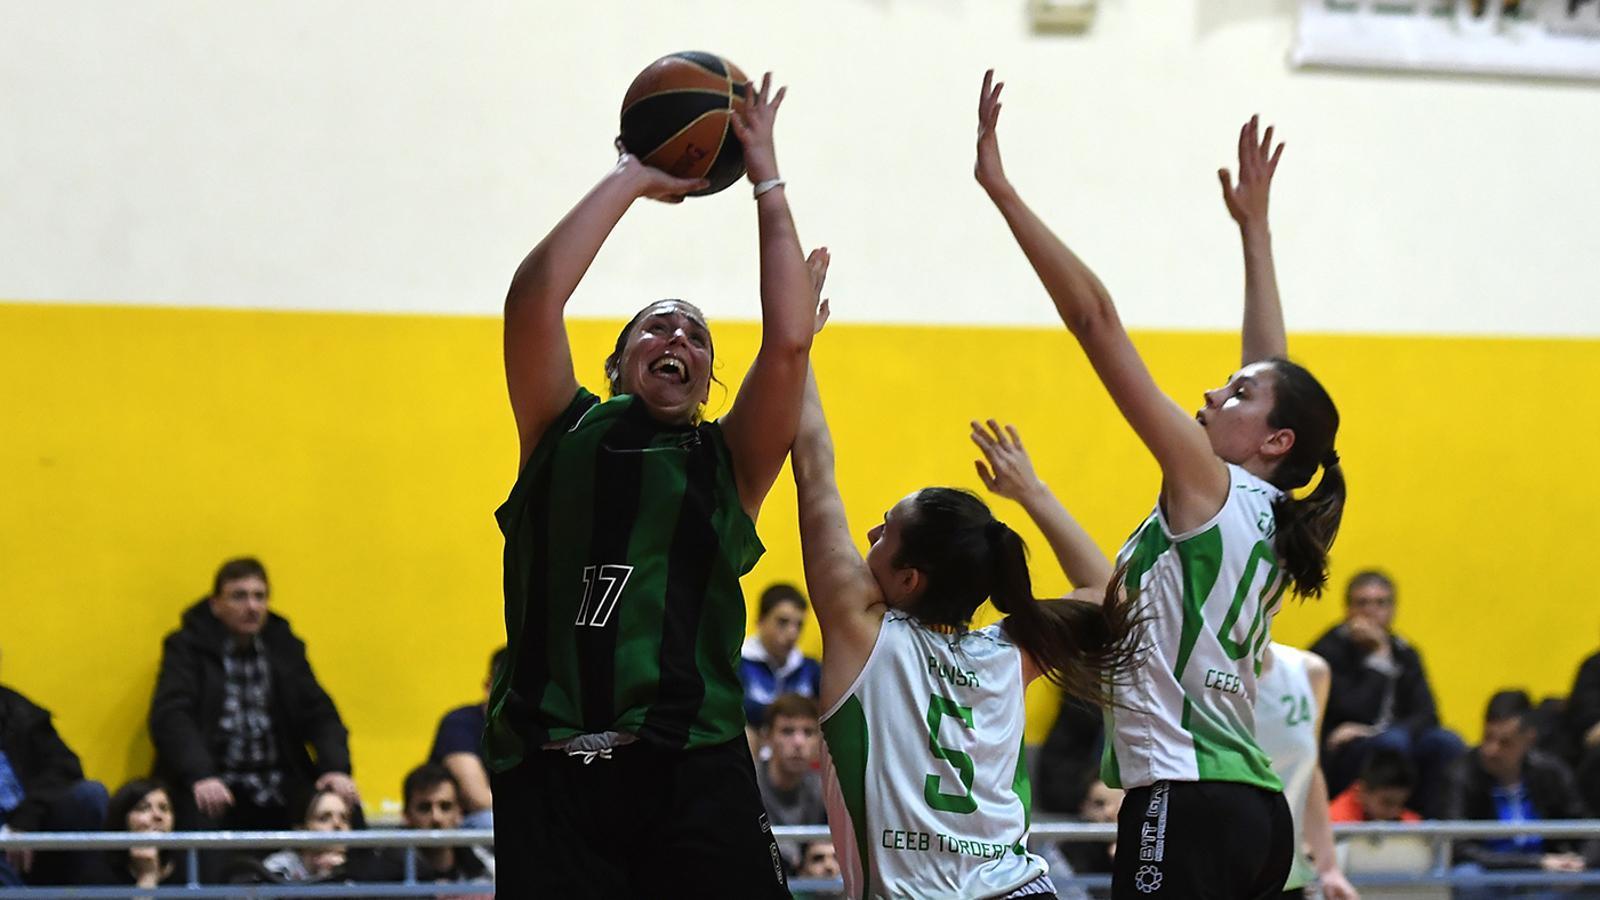 El Joventut femení jugarà a lliga Femenina 2